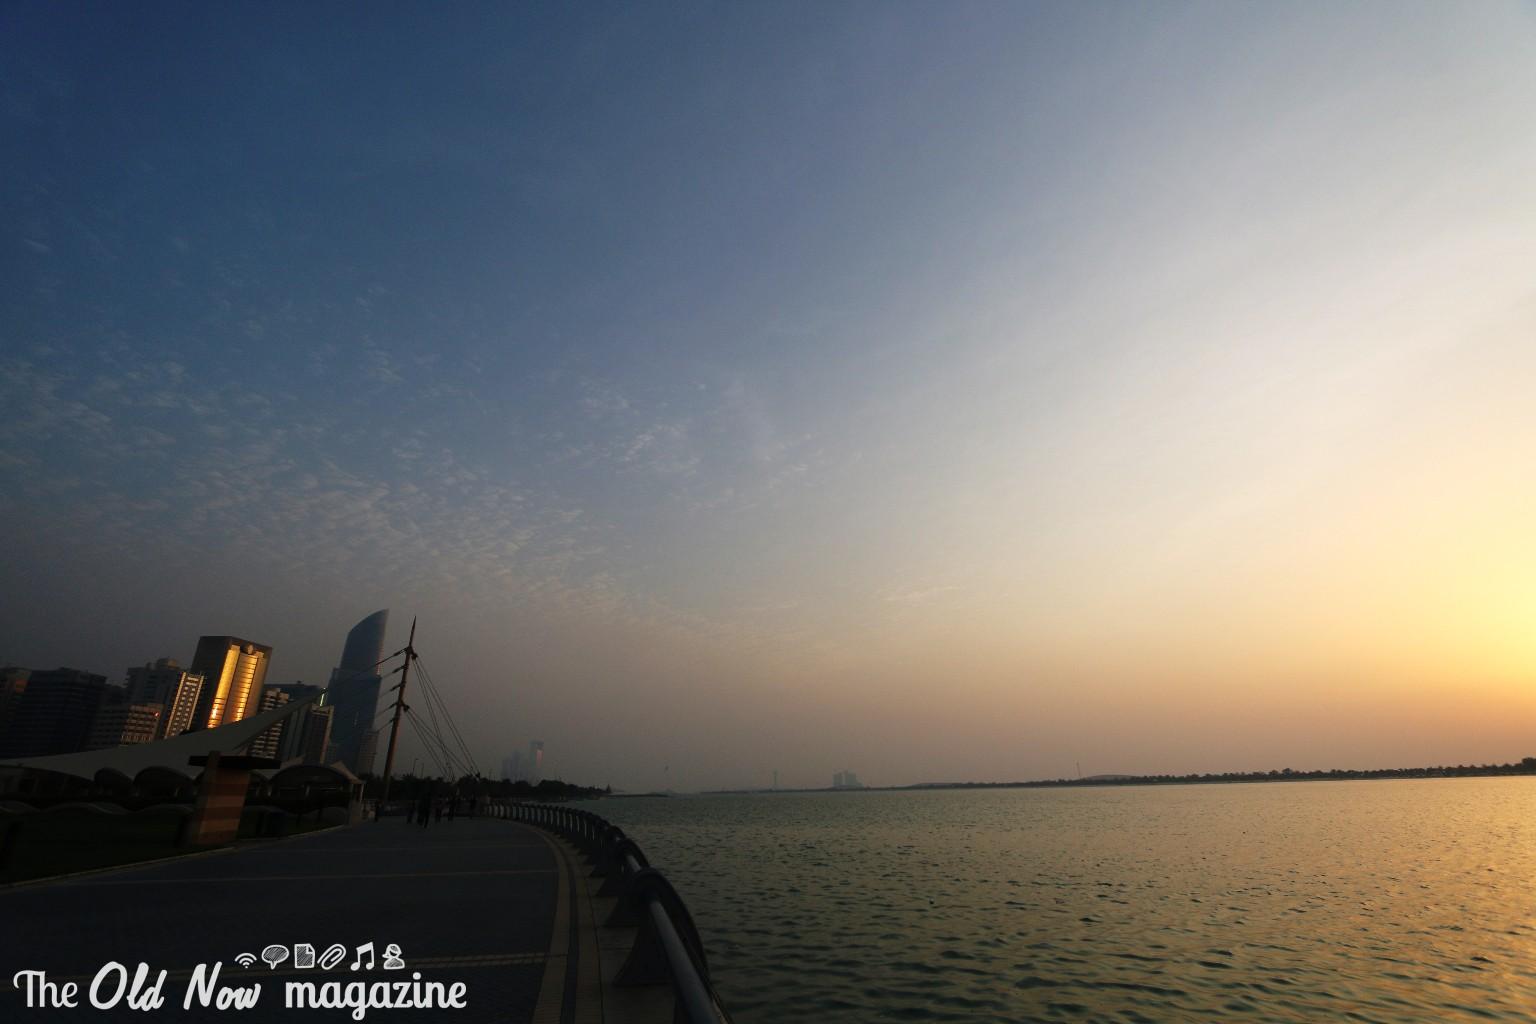 Abu Dhabi THEOLDNOW DAY 1 (31)